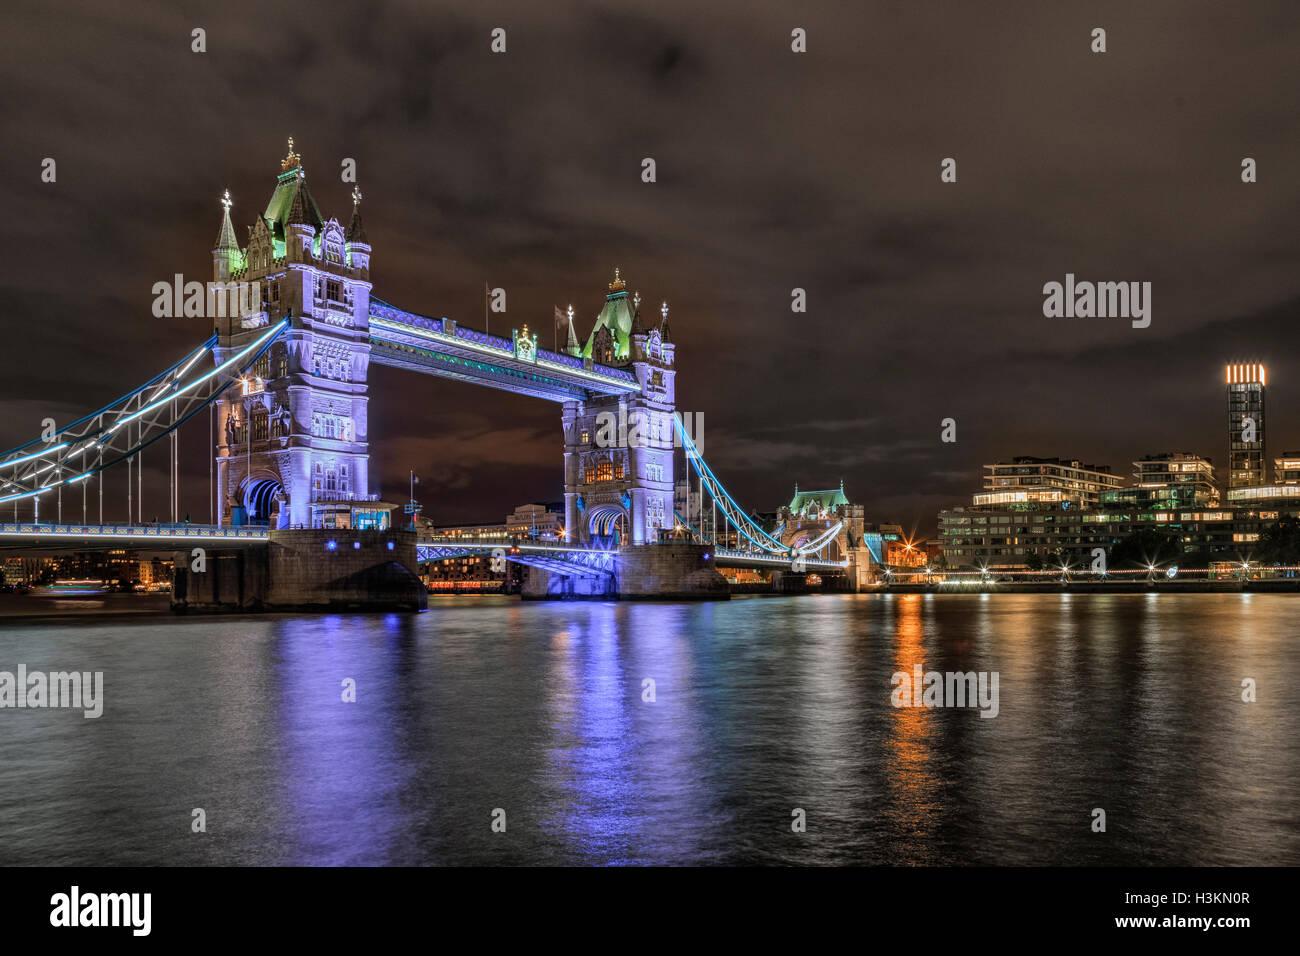 Tower Bridge, London, England, UK Photo Stock